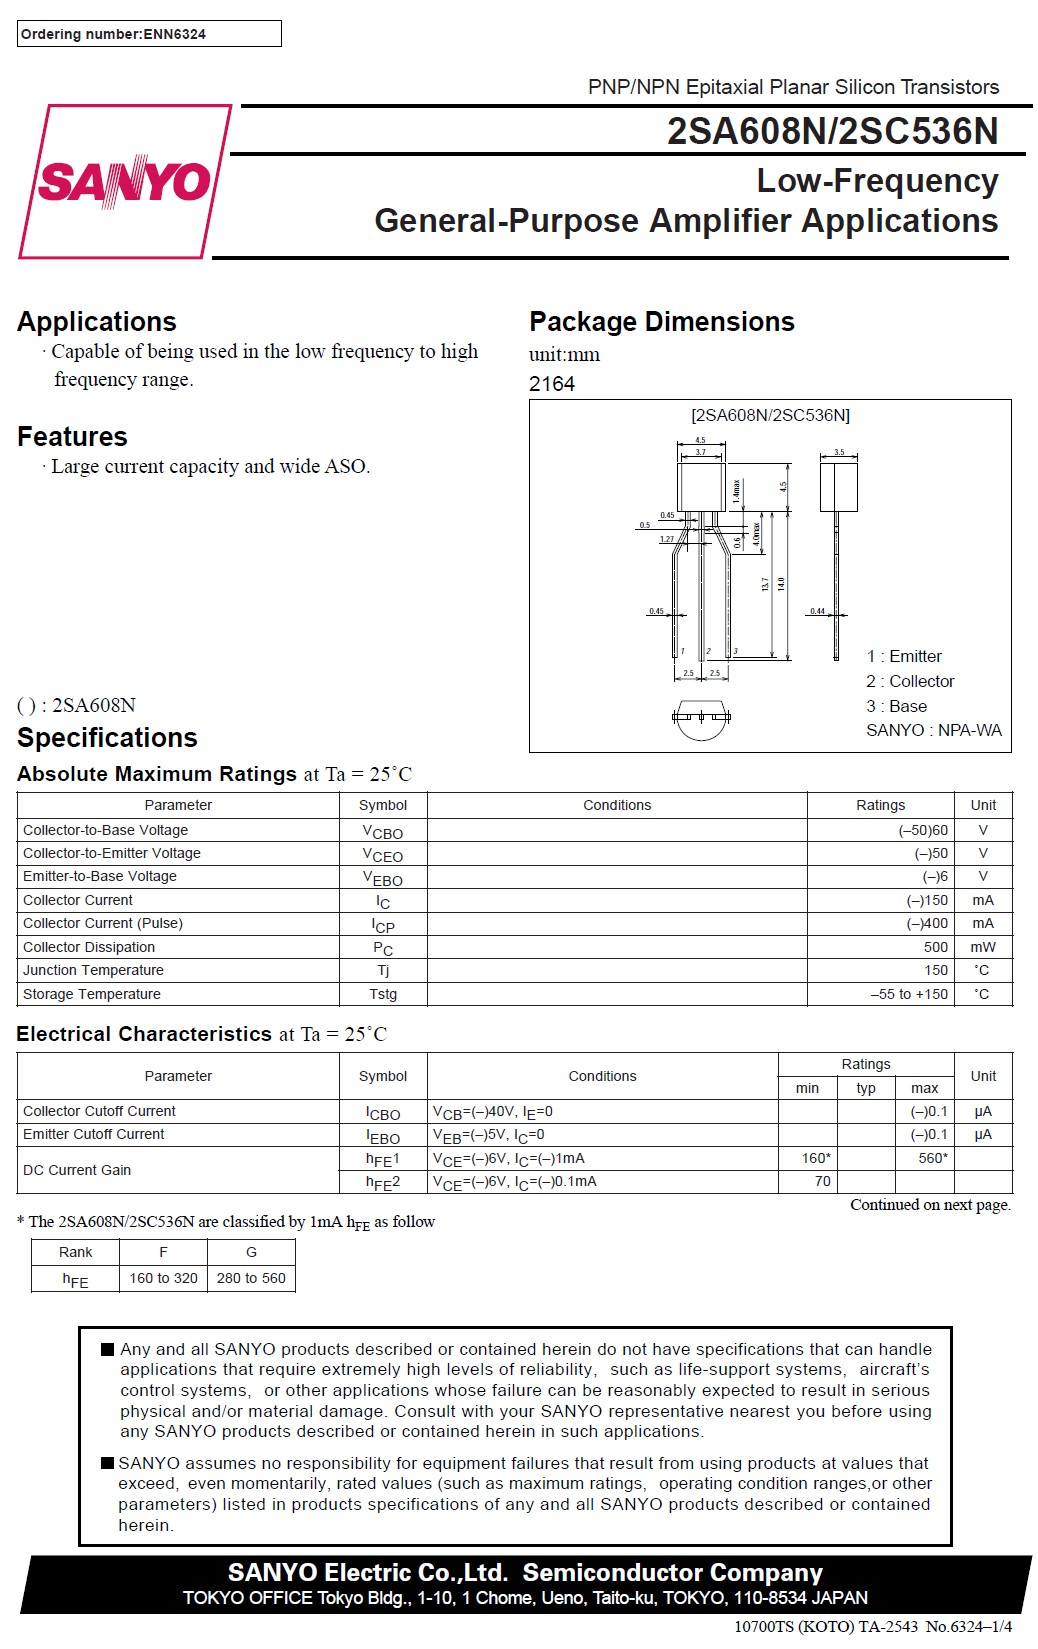 Tranzisztor PNP 50V 0.15A 0.5W 200MHz UNI 2SA608 2SA608